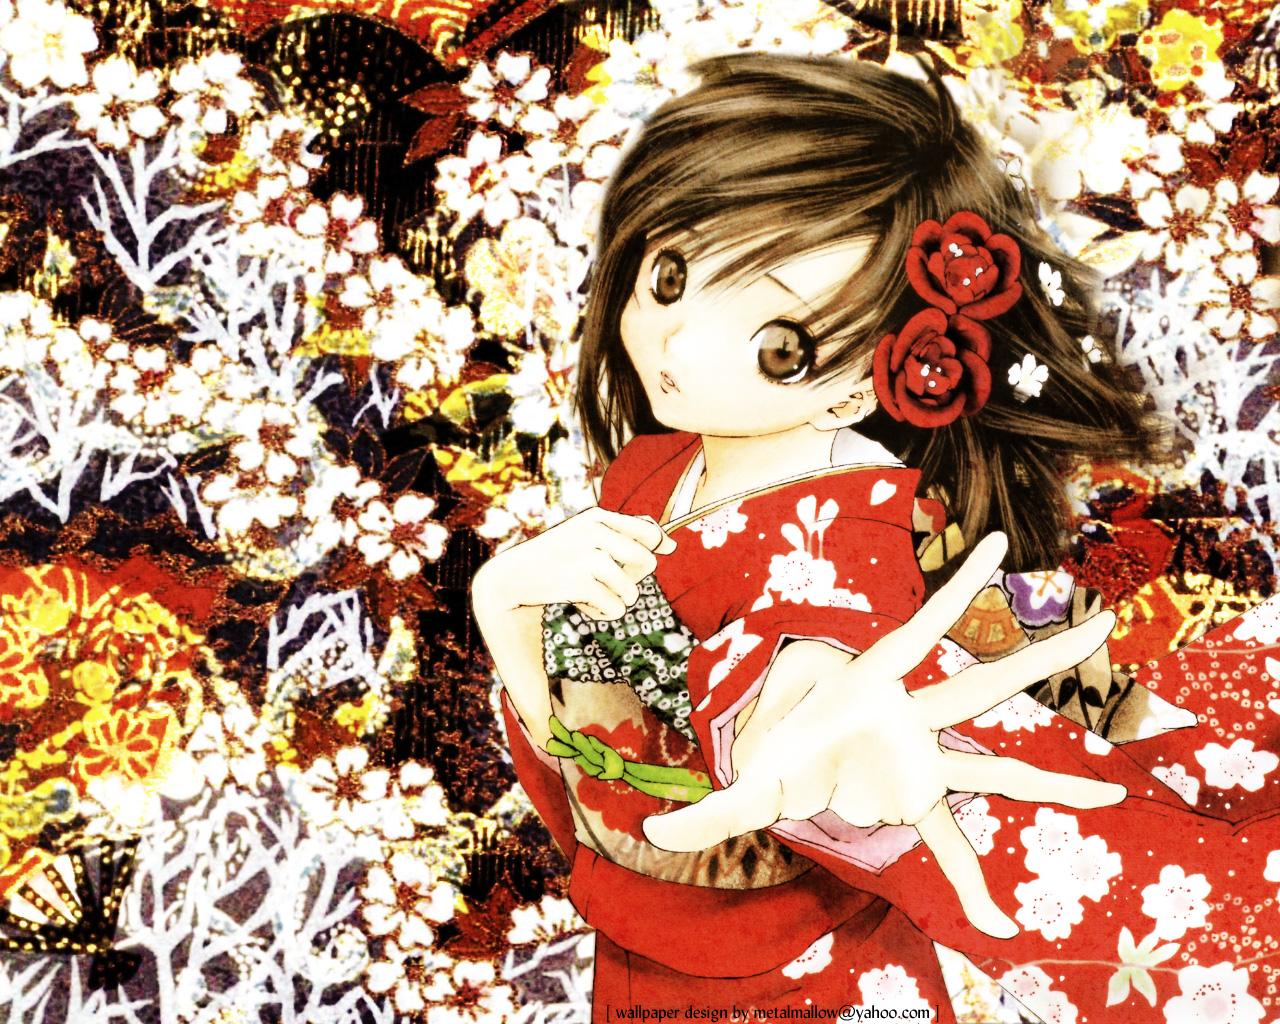 1280x1024 > Ichigo 100% Wallpapers